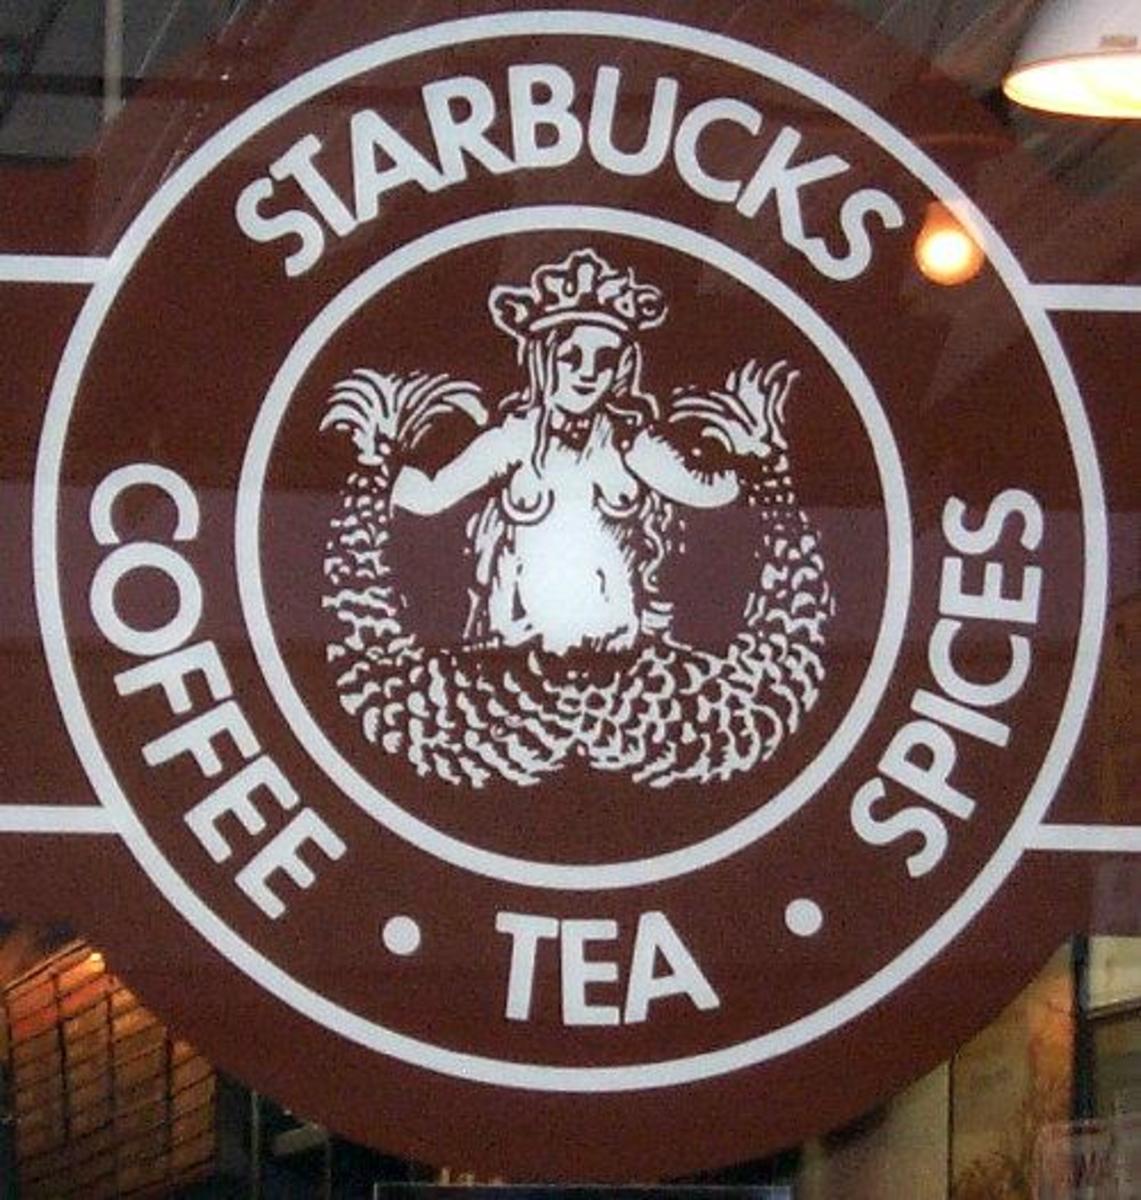 The original Starbucks Siren